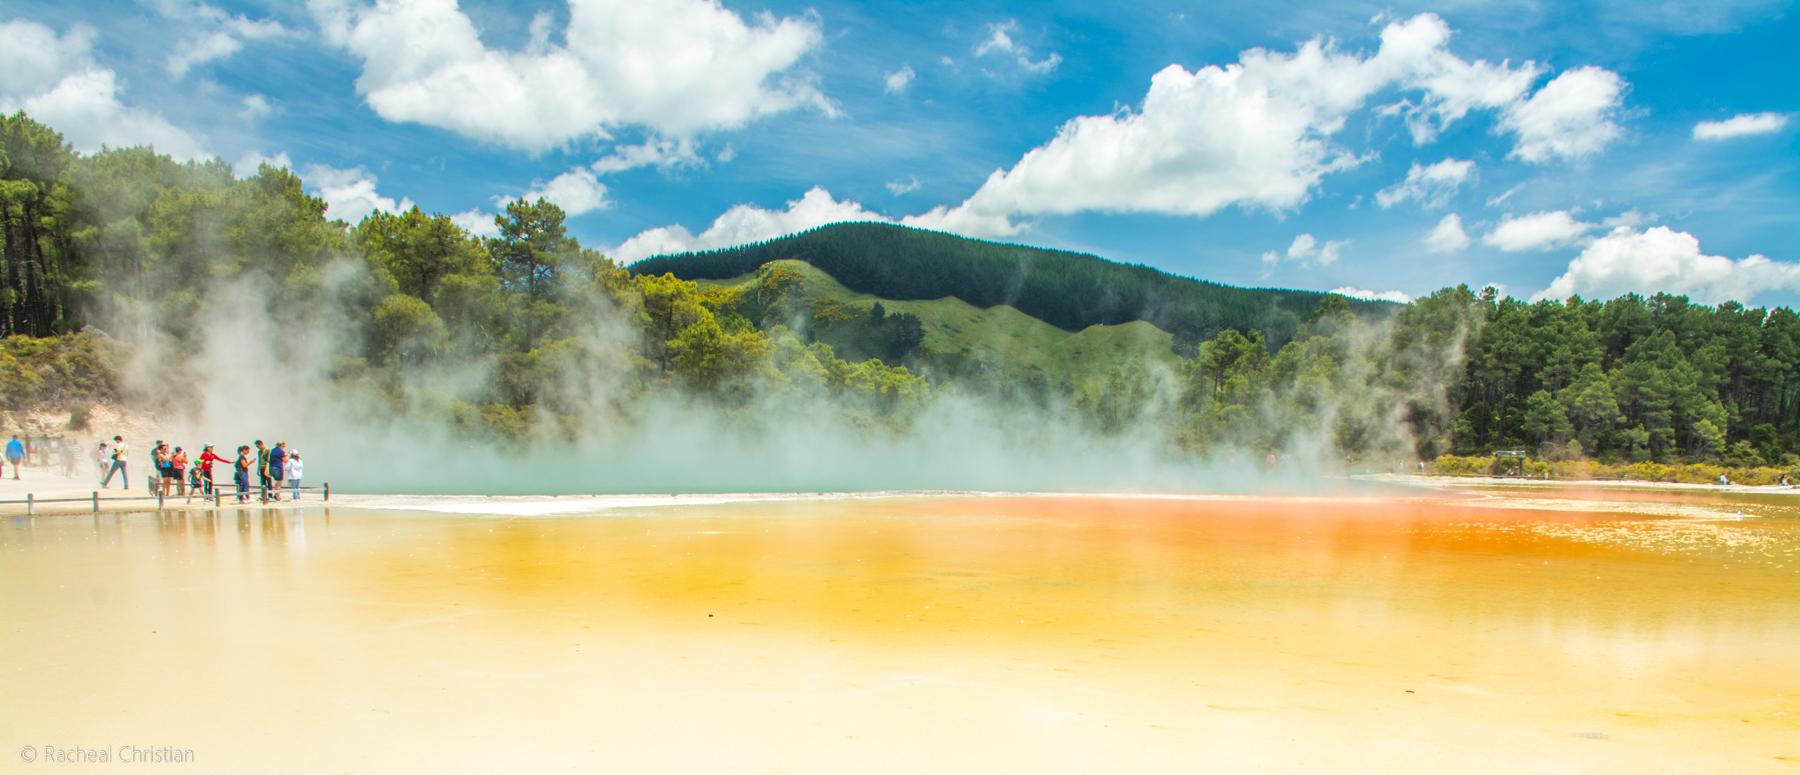 Wai-O-Tapu Thermal Wonderland  Rotorua, New Zealand - Champagne Pool by Racheal Christian